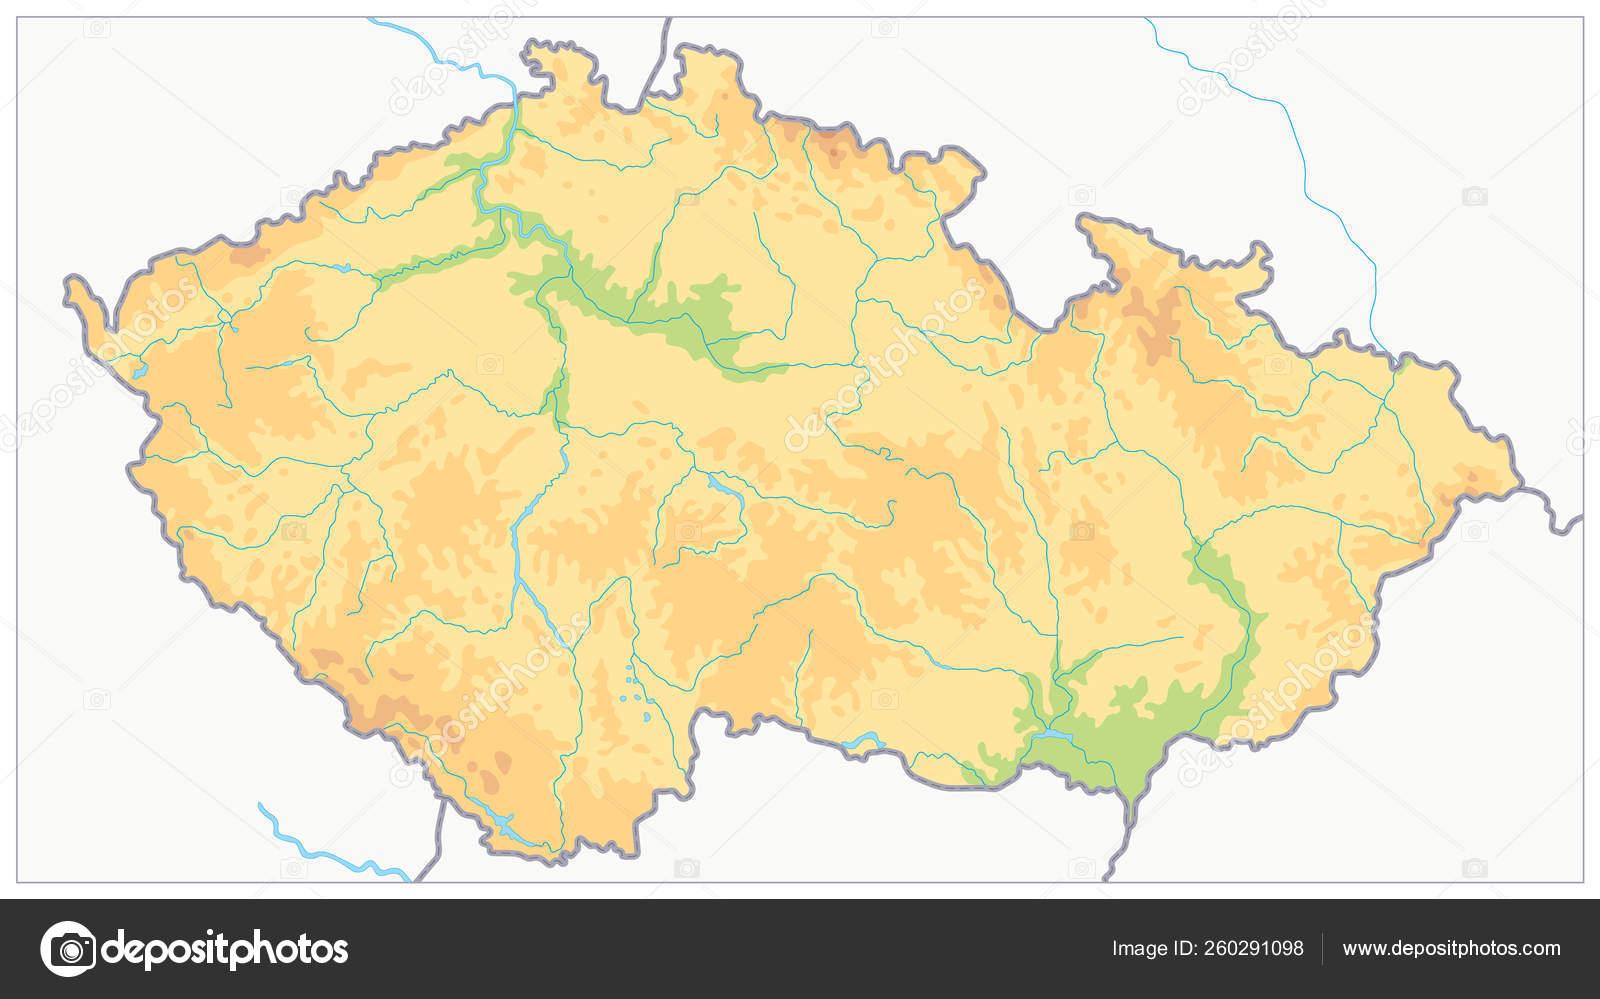 Picture of: Czech Republic Physical Map No Text Stock Vector C Cartarium 260291098